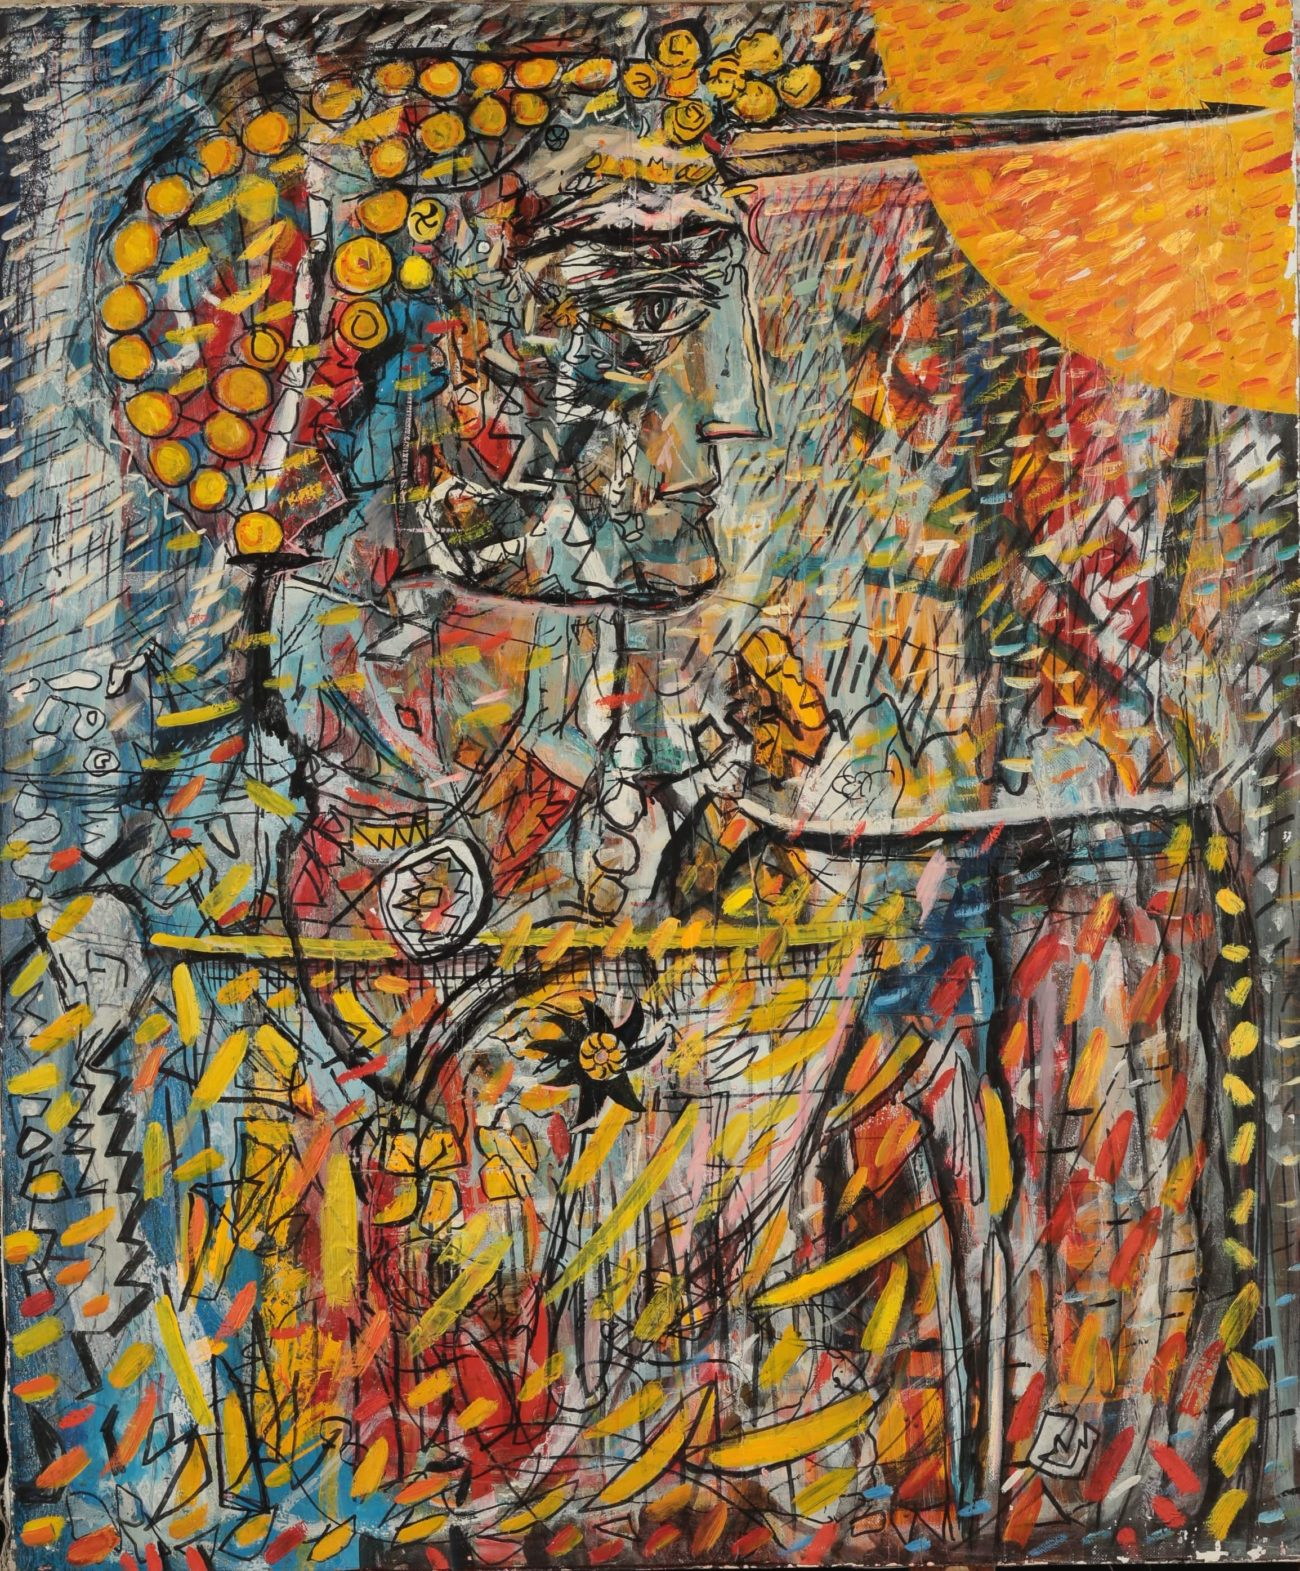 The Son of the Sun. Temo Svirely, georgian-ukrainian artist (born 1965 in Georgia- died 2014 in Ukraine), oil, canvas, 1997